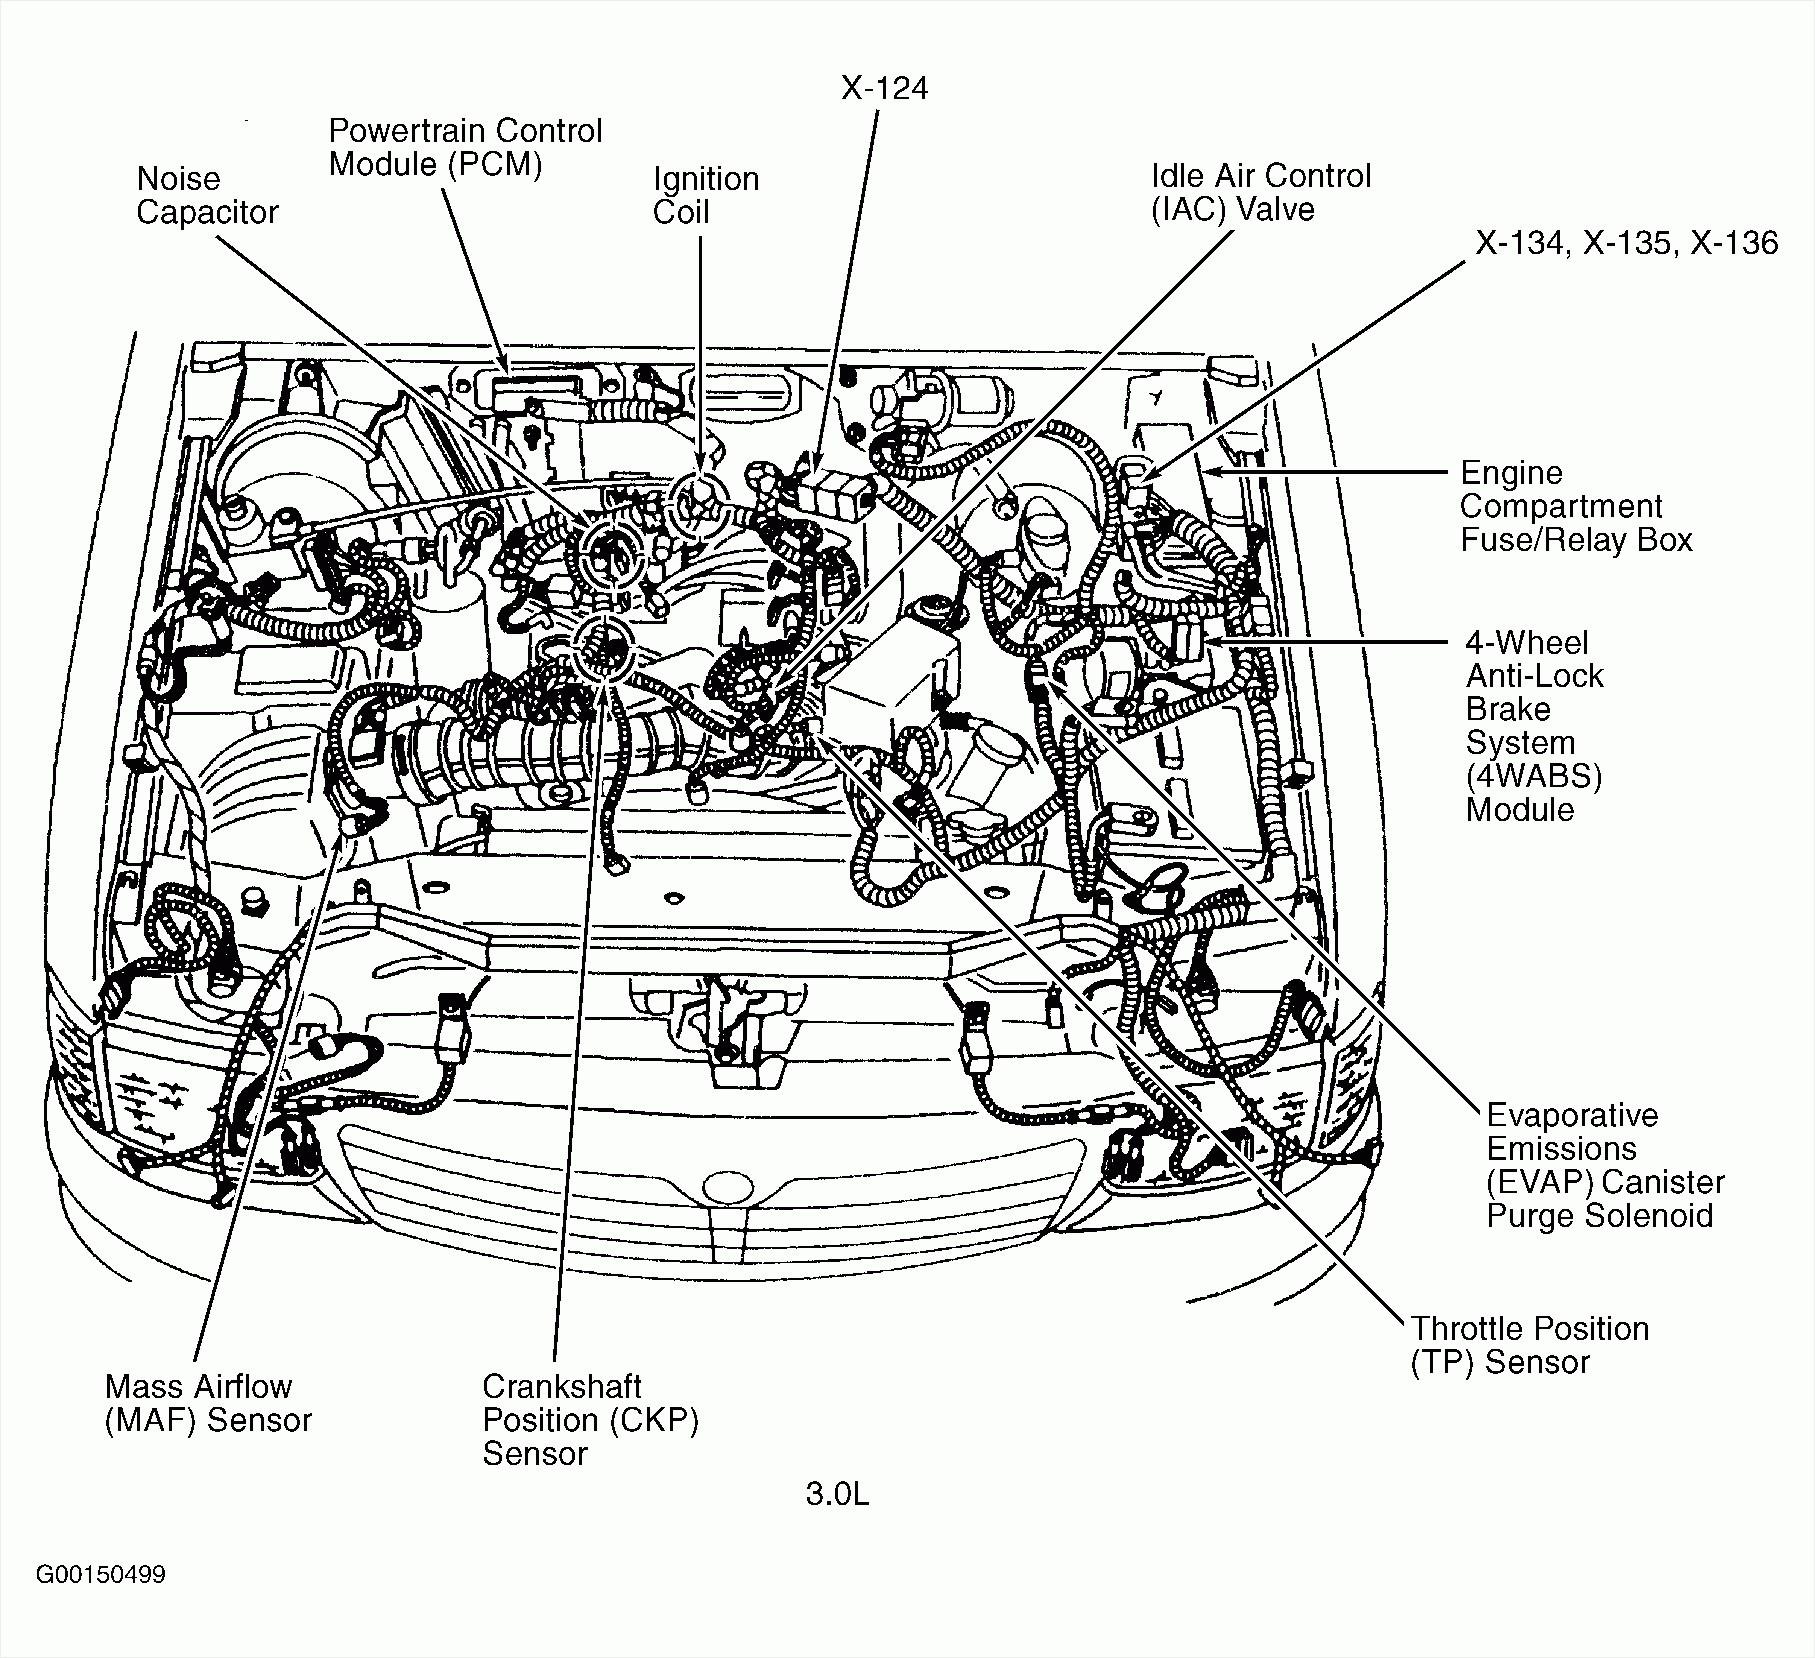 Nissan Engine Diagram Chevy 2 8 Engine Diagram Schema Wiring Diagram Of Nissan Engine Diagram